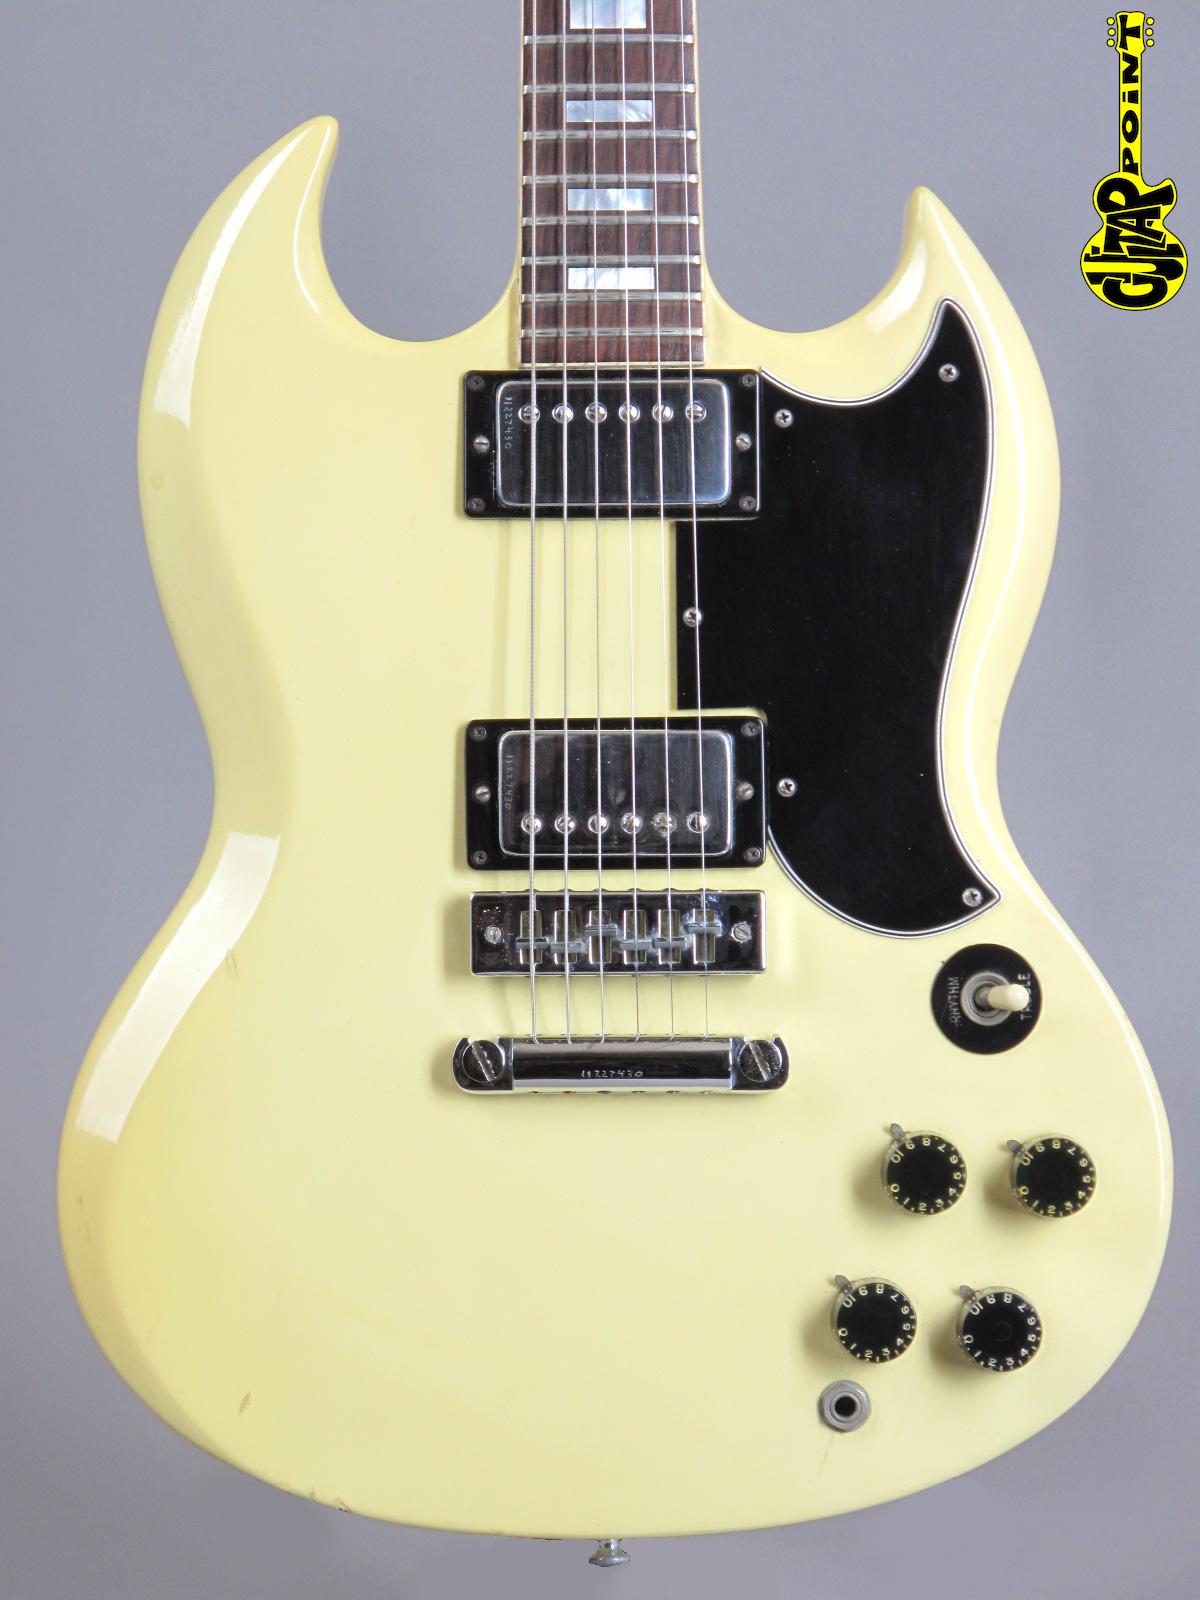 1976 Gibson SG Standard - White (!)